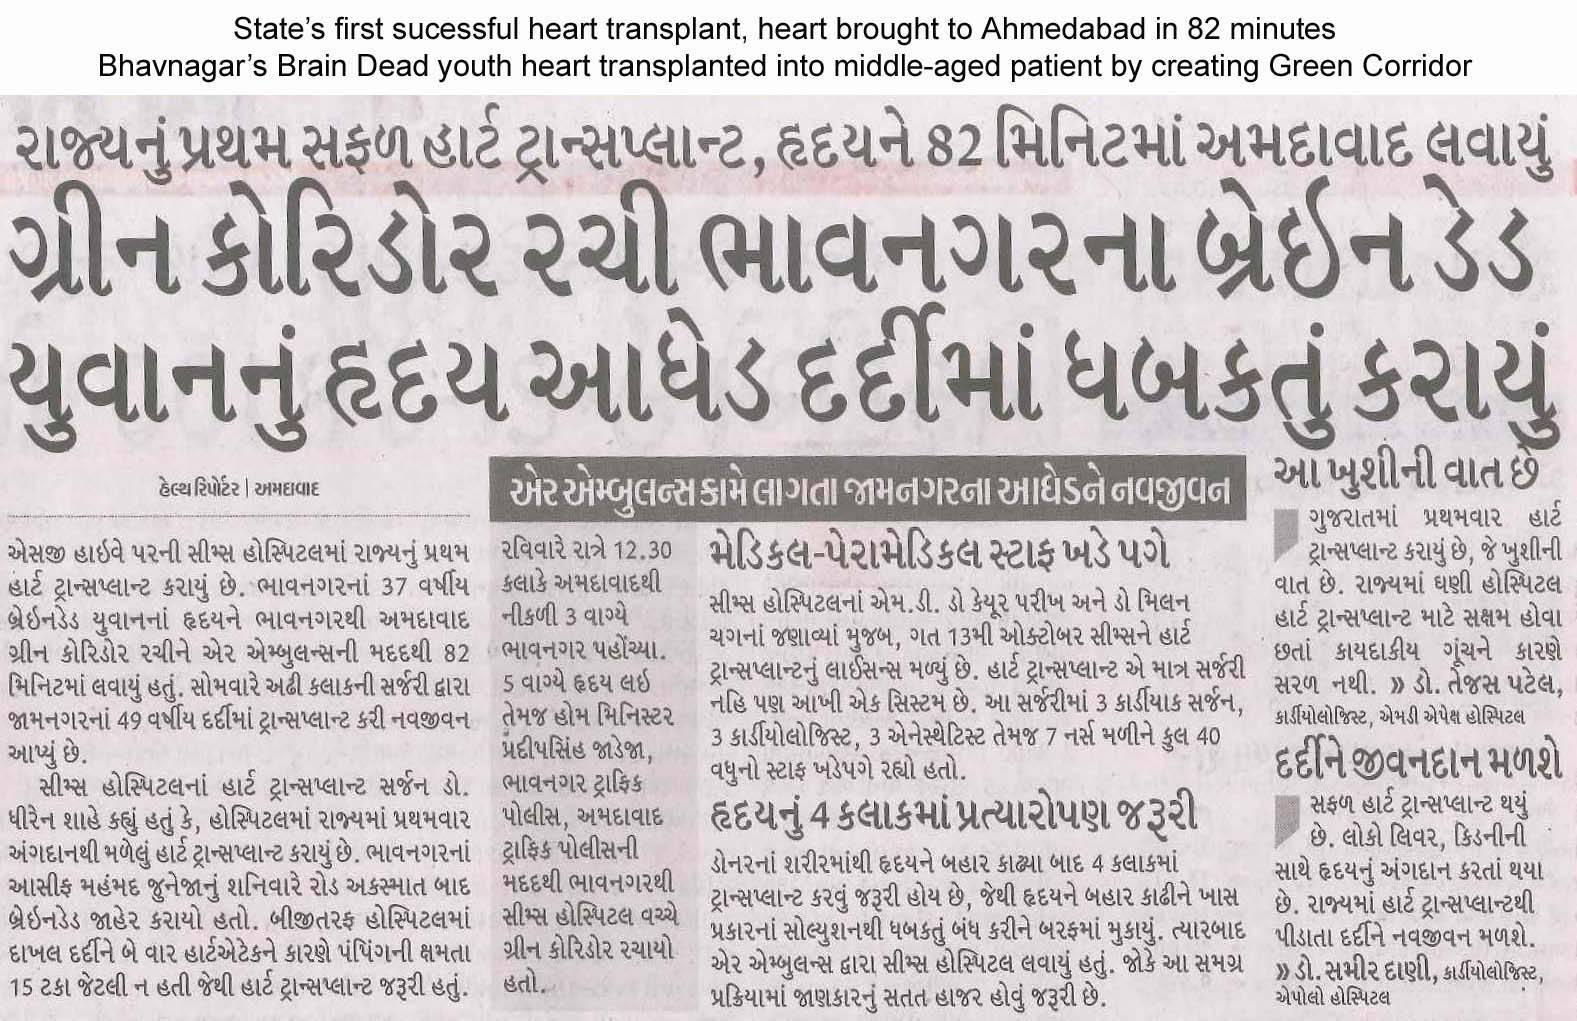 Divya Bhaskar (Ahd)_CIMS (1st Heart transplant in Gujarat)_20.12.16_Pg 09-